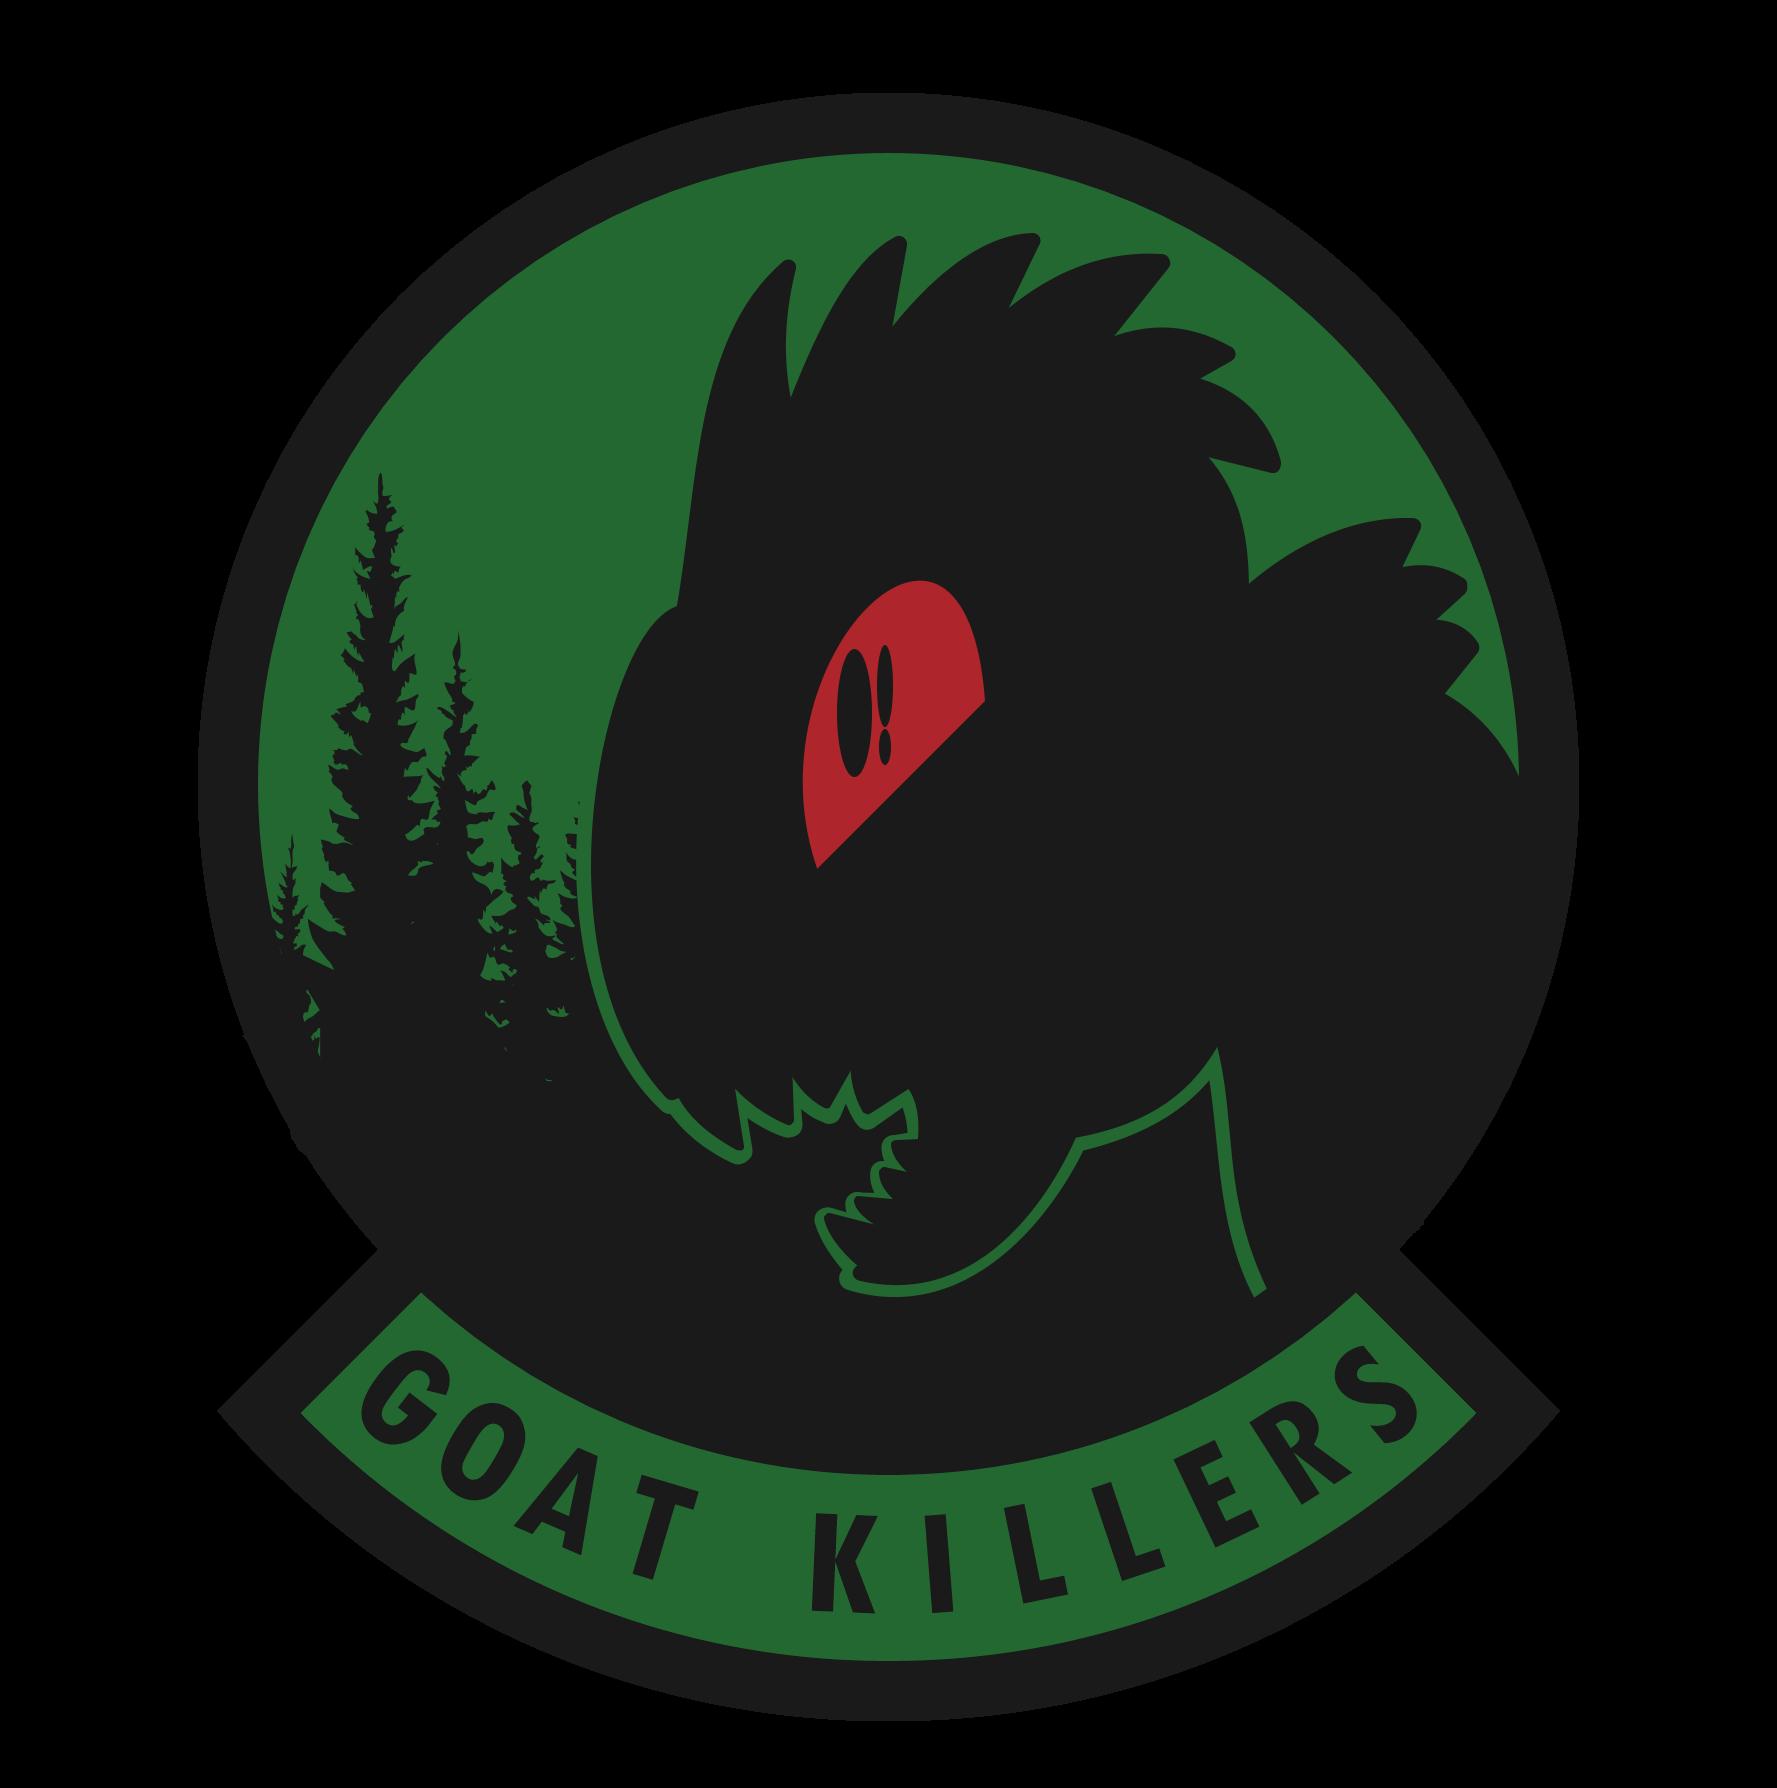 SOUTHCOM_Goat_Killers.png